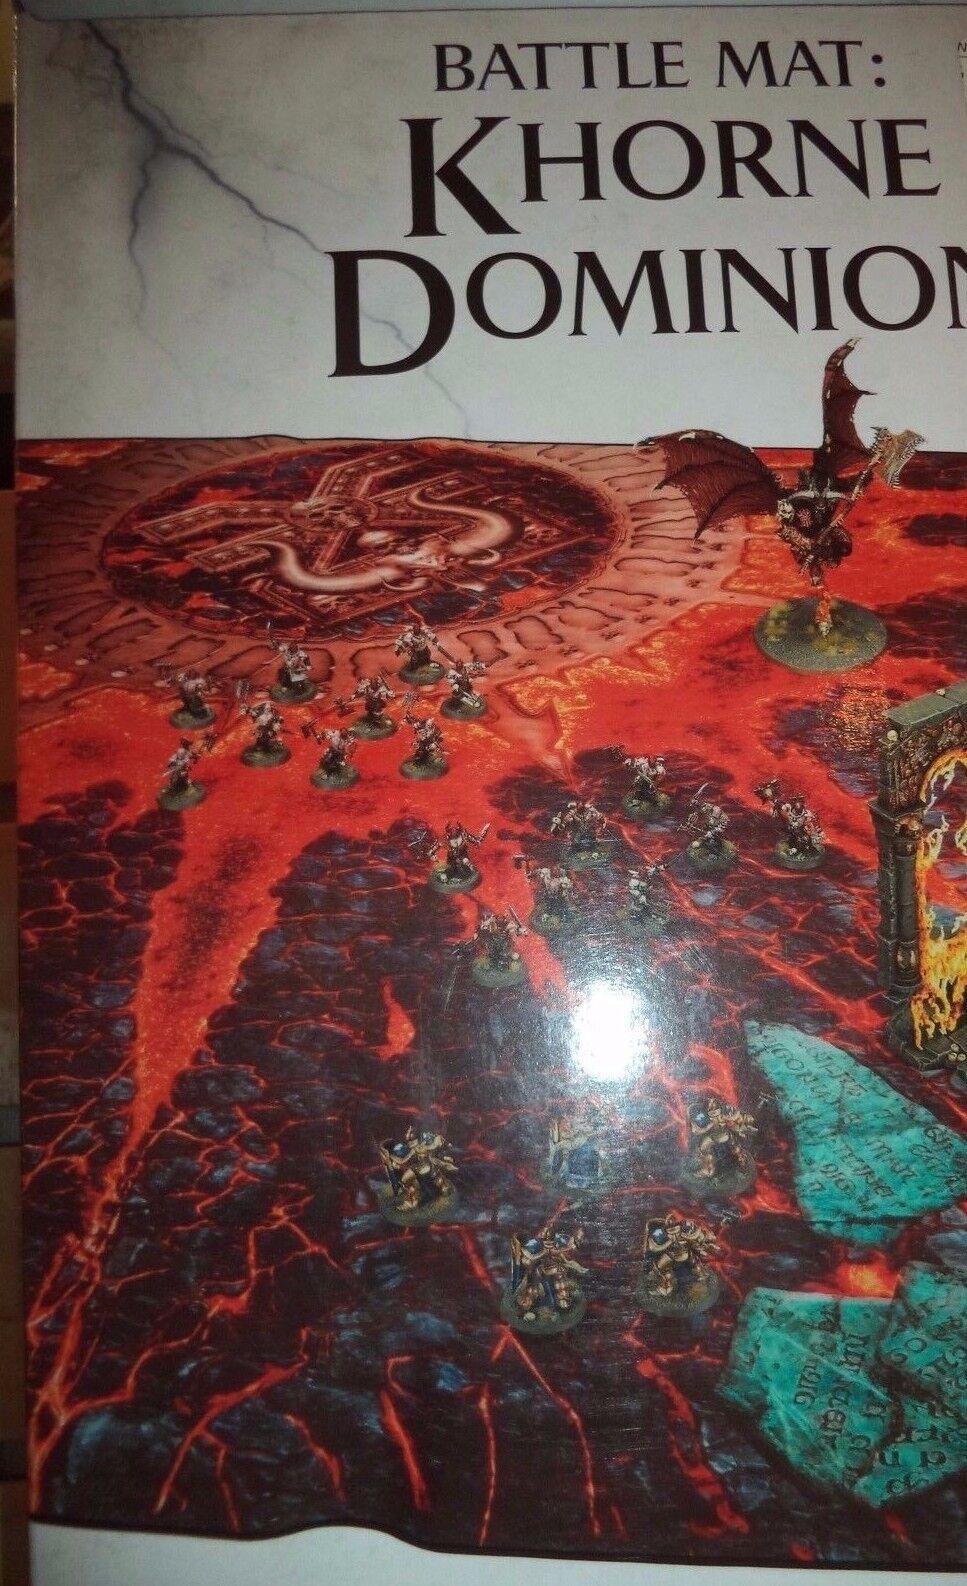 slåss Mat  Khorne Dominion Warhammer Age of Sigmar 40k spel arbetarhop 40,000 New